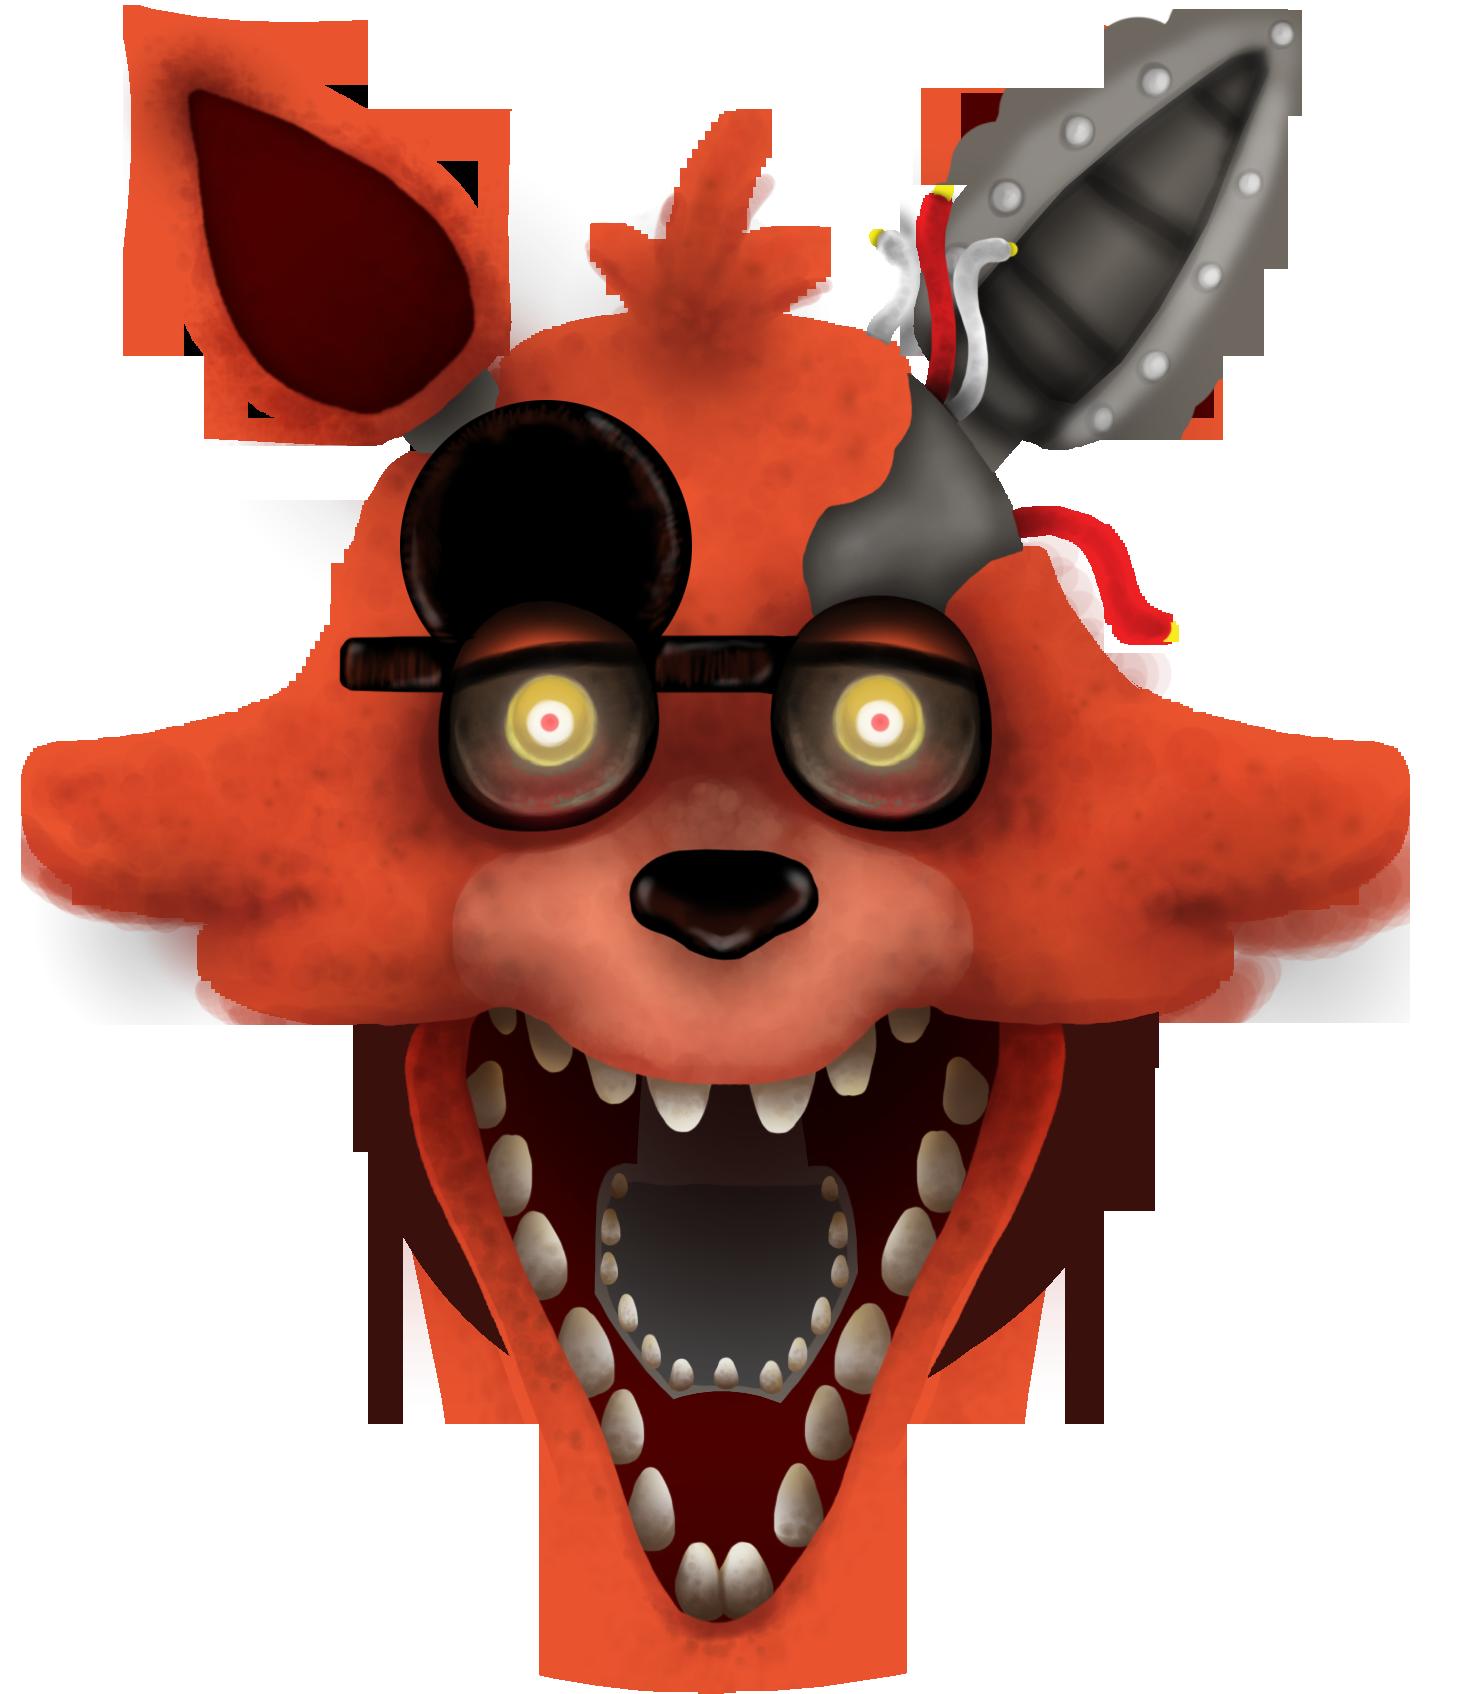 FNAF2 Foxy's Head By Pin-eye On DeviantArt